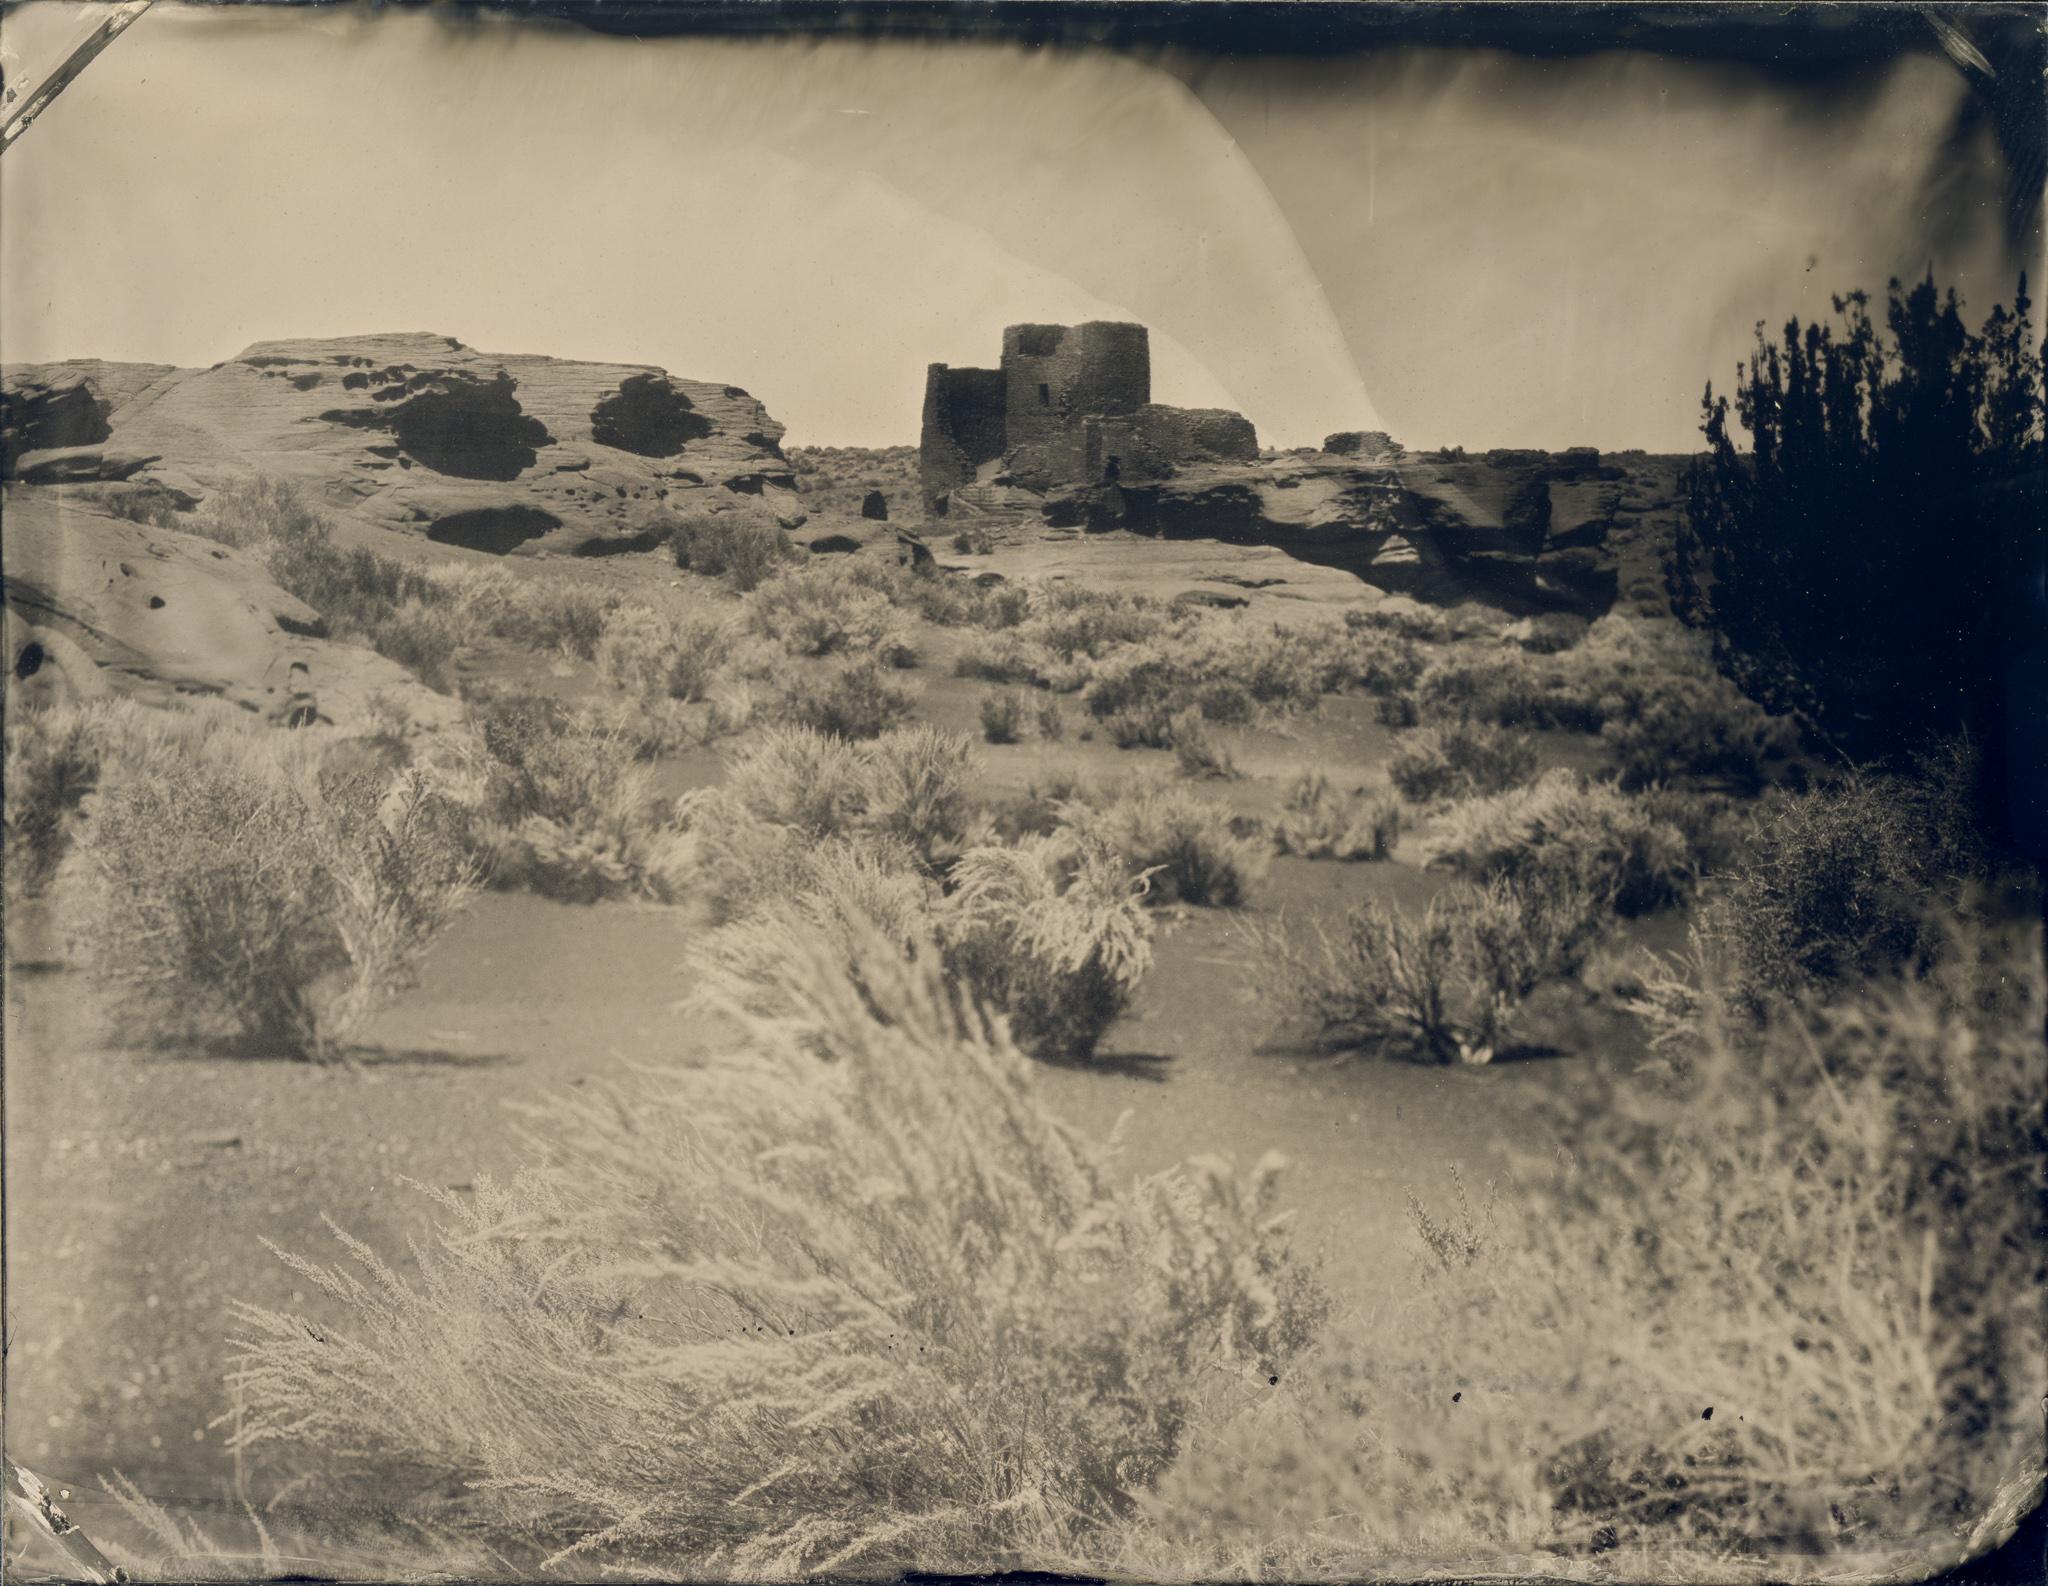 Wukoki Pueblo and the Grand Canyon Tintypes